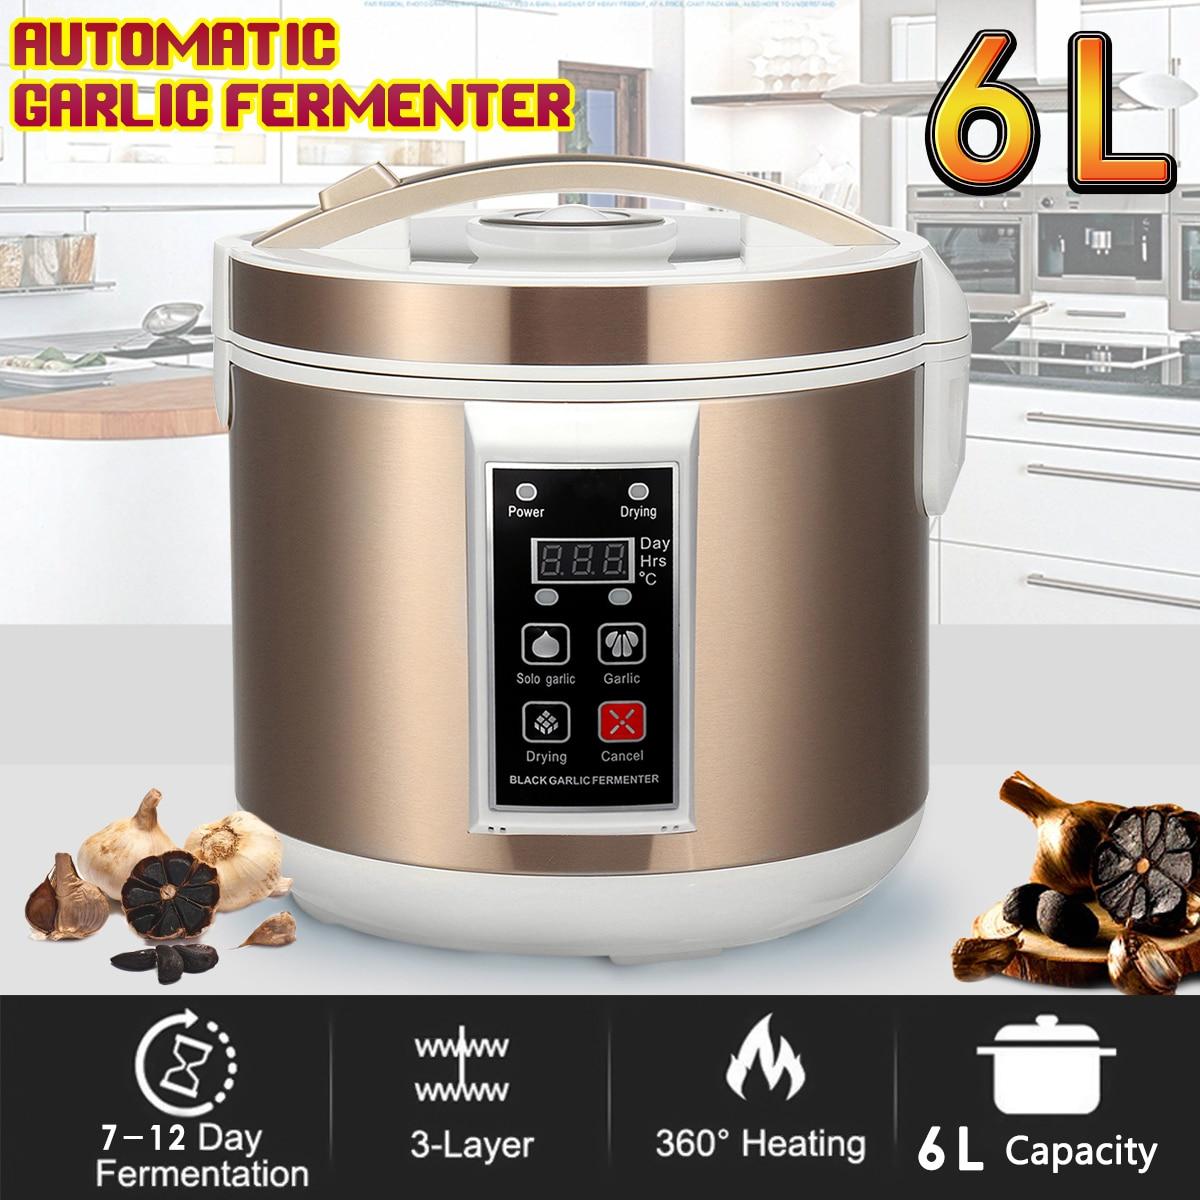 220V EU/US 6L Automatic Black Garlic Fermenter Maker Zymolysis Machine Electric Household Heating Healthy Natural Organic